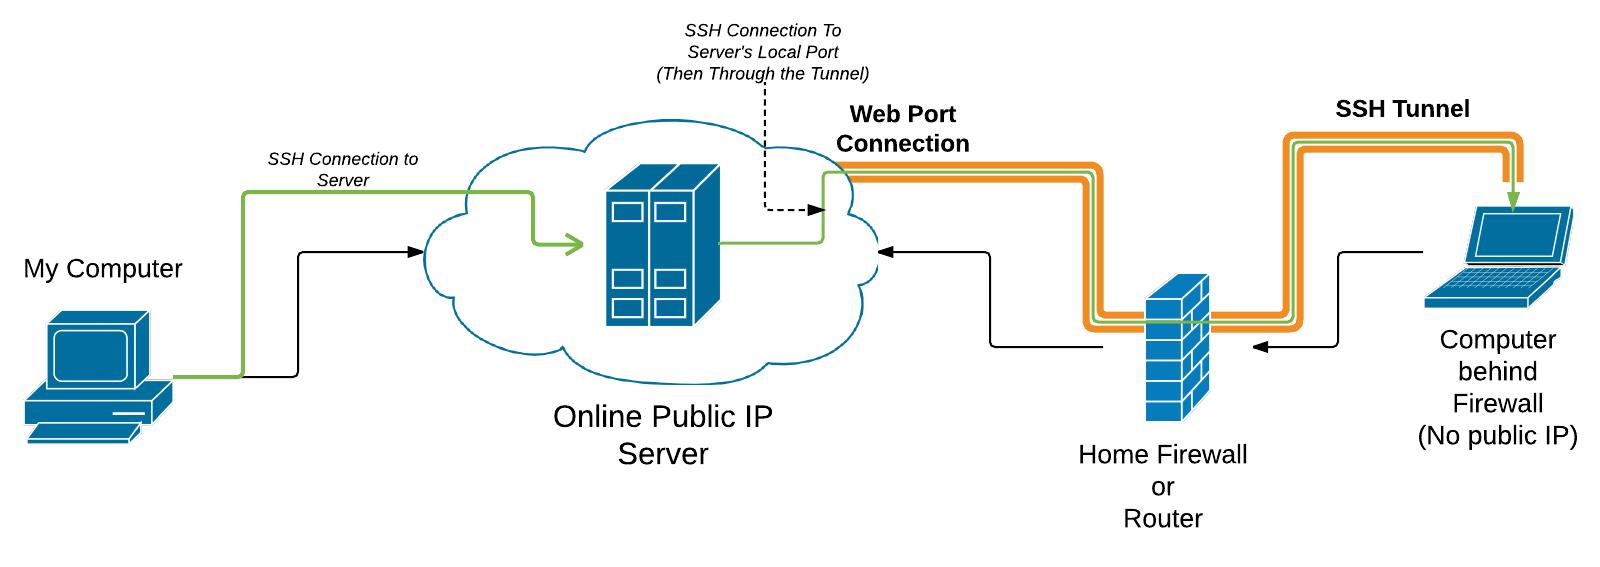 hight resolution of computer behind firewall